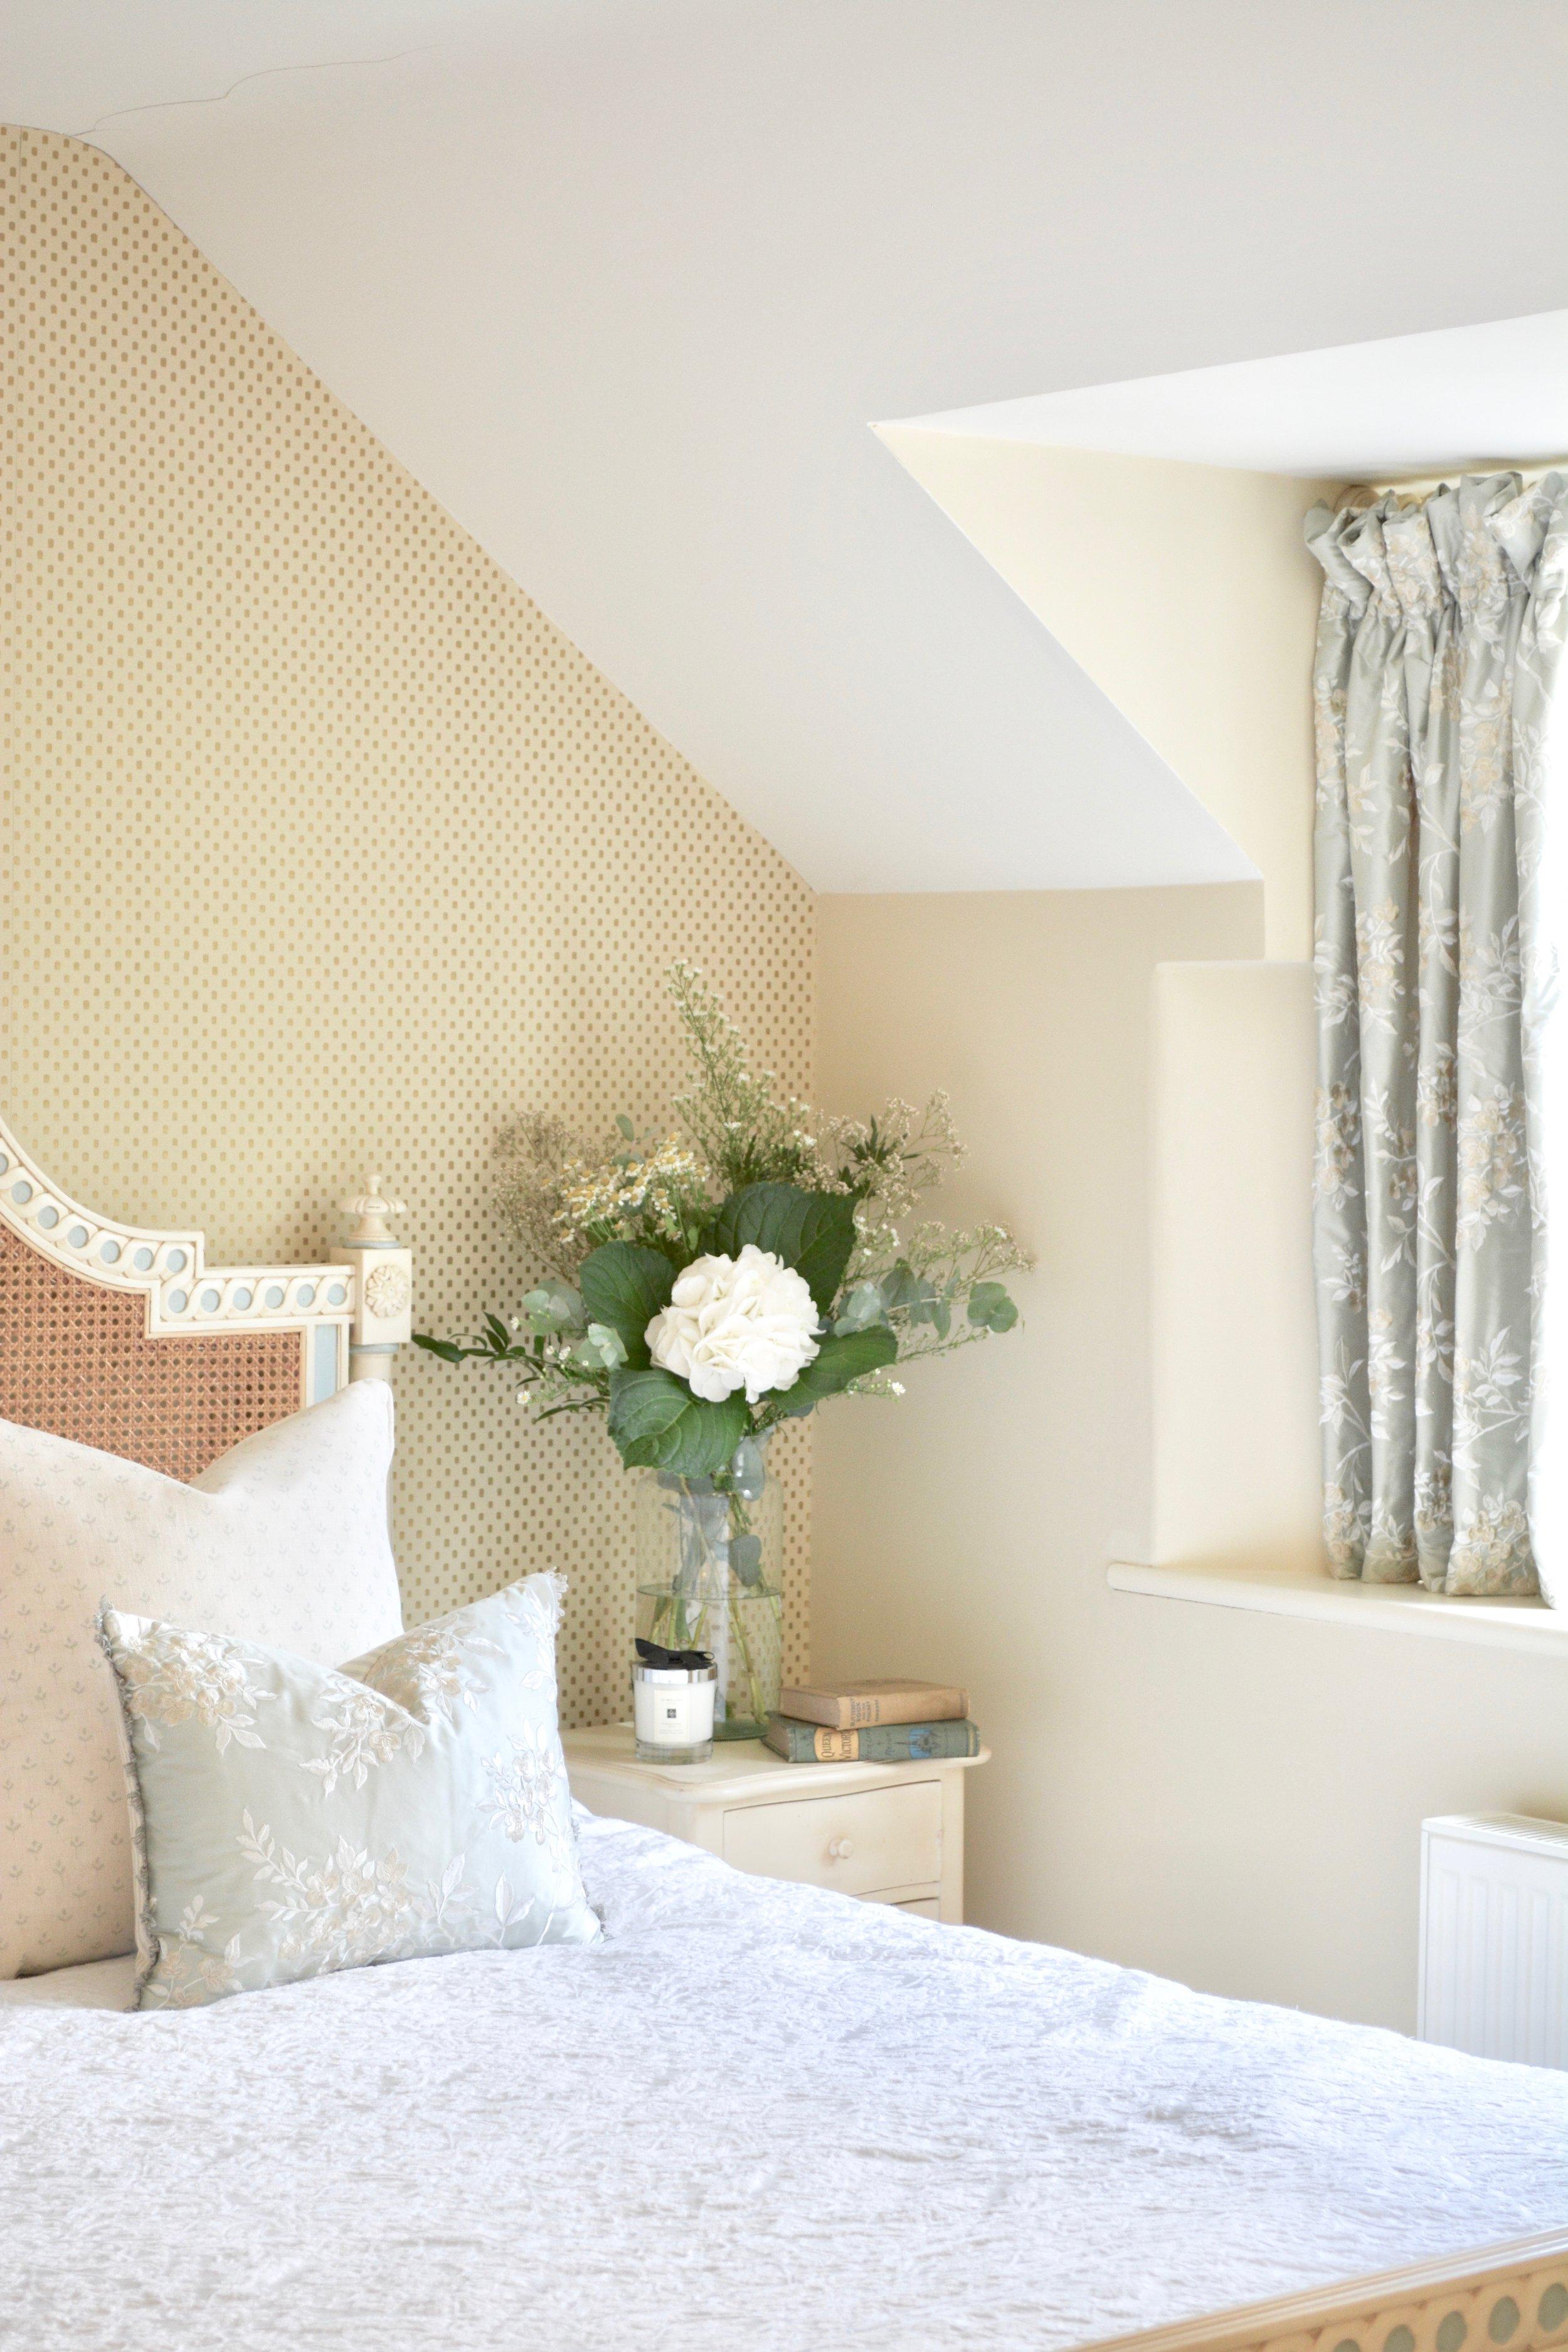 Country Cottage Bedroom Designed by Hannah Llewelyn Interior Design www.hlinteriors.co.uk.jpg